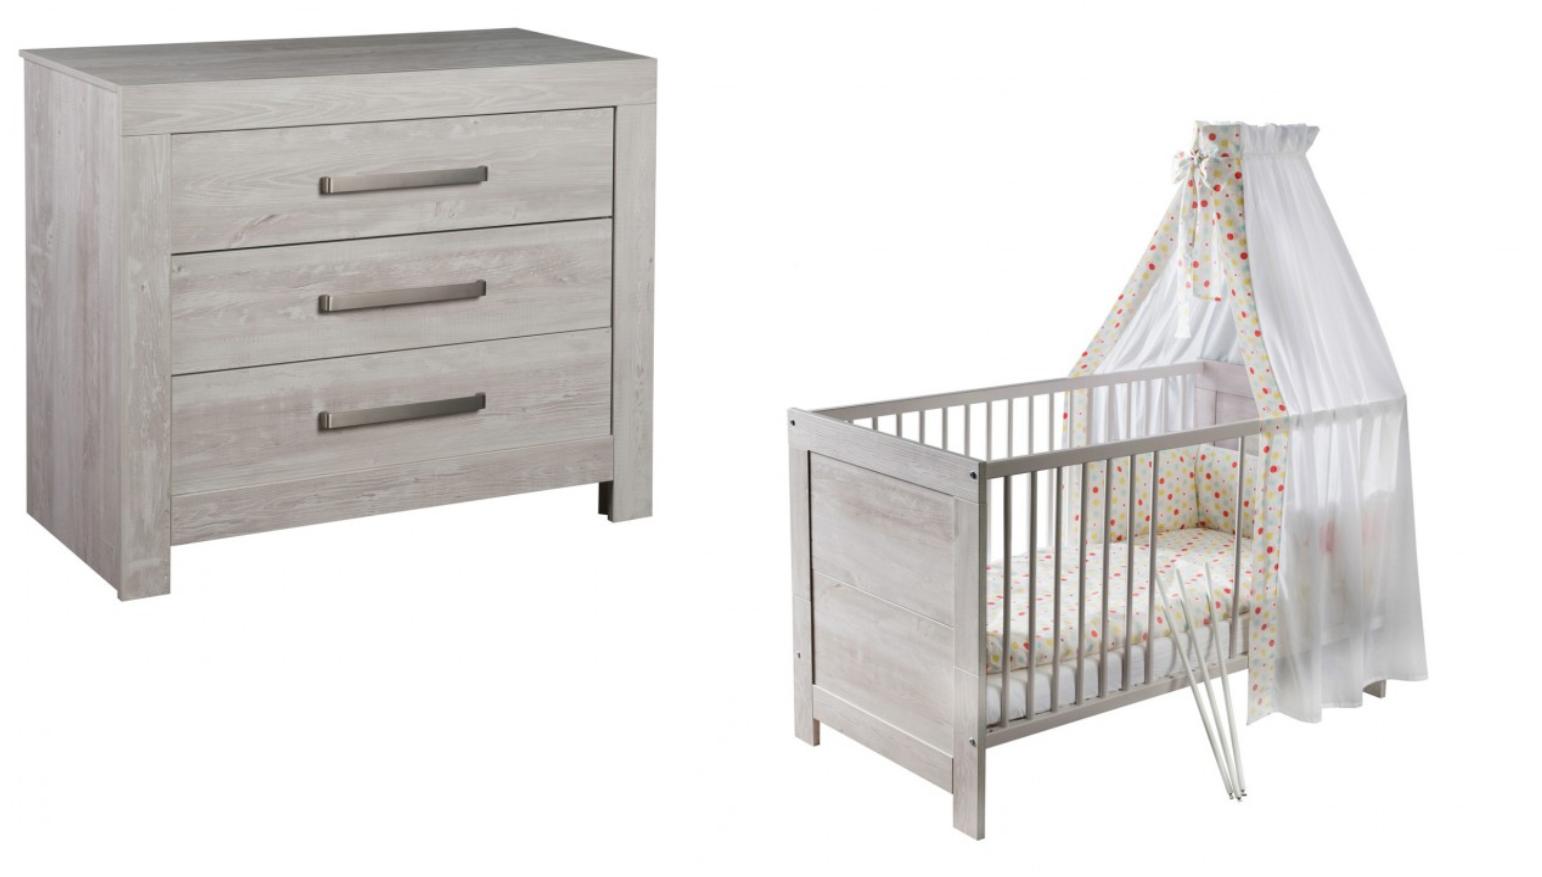 Ledikant Plus Commode.Aanbieding Colorfull Home Babykamer Classy Grey Ledikant Commode